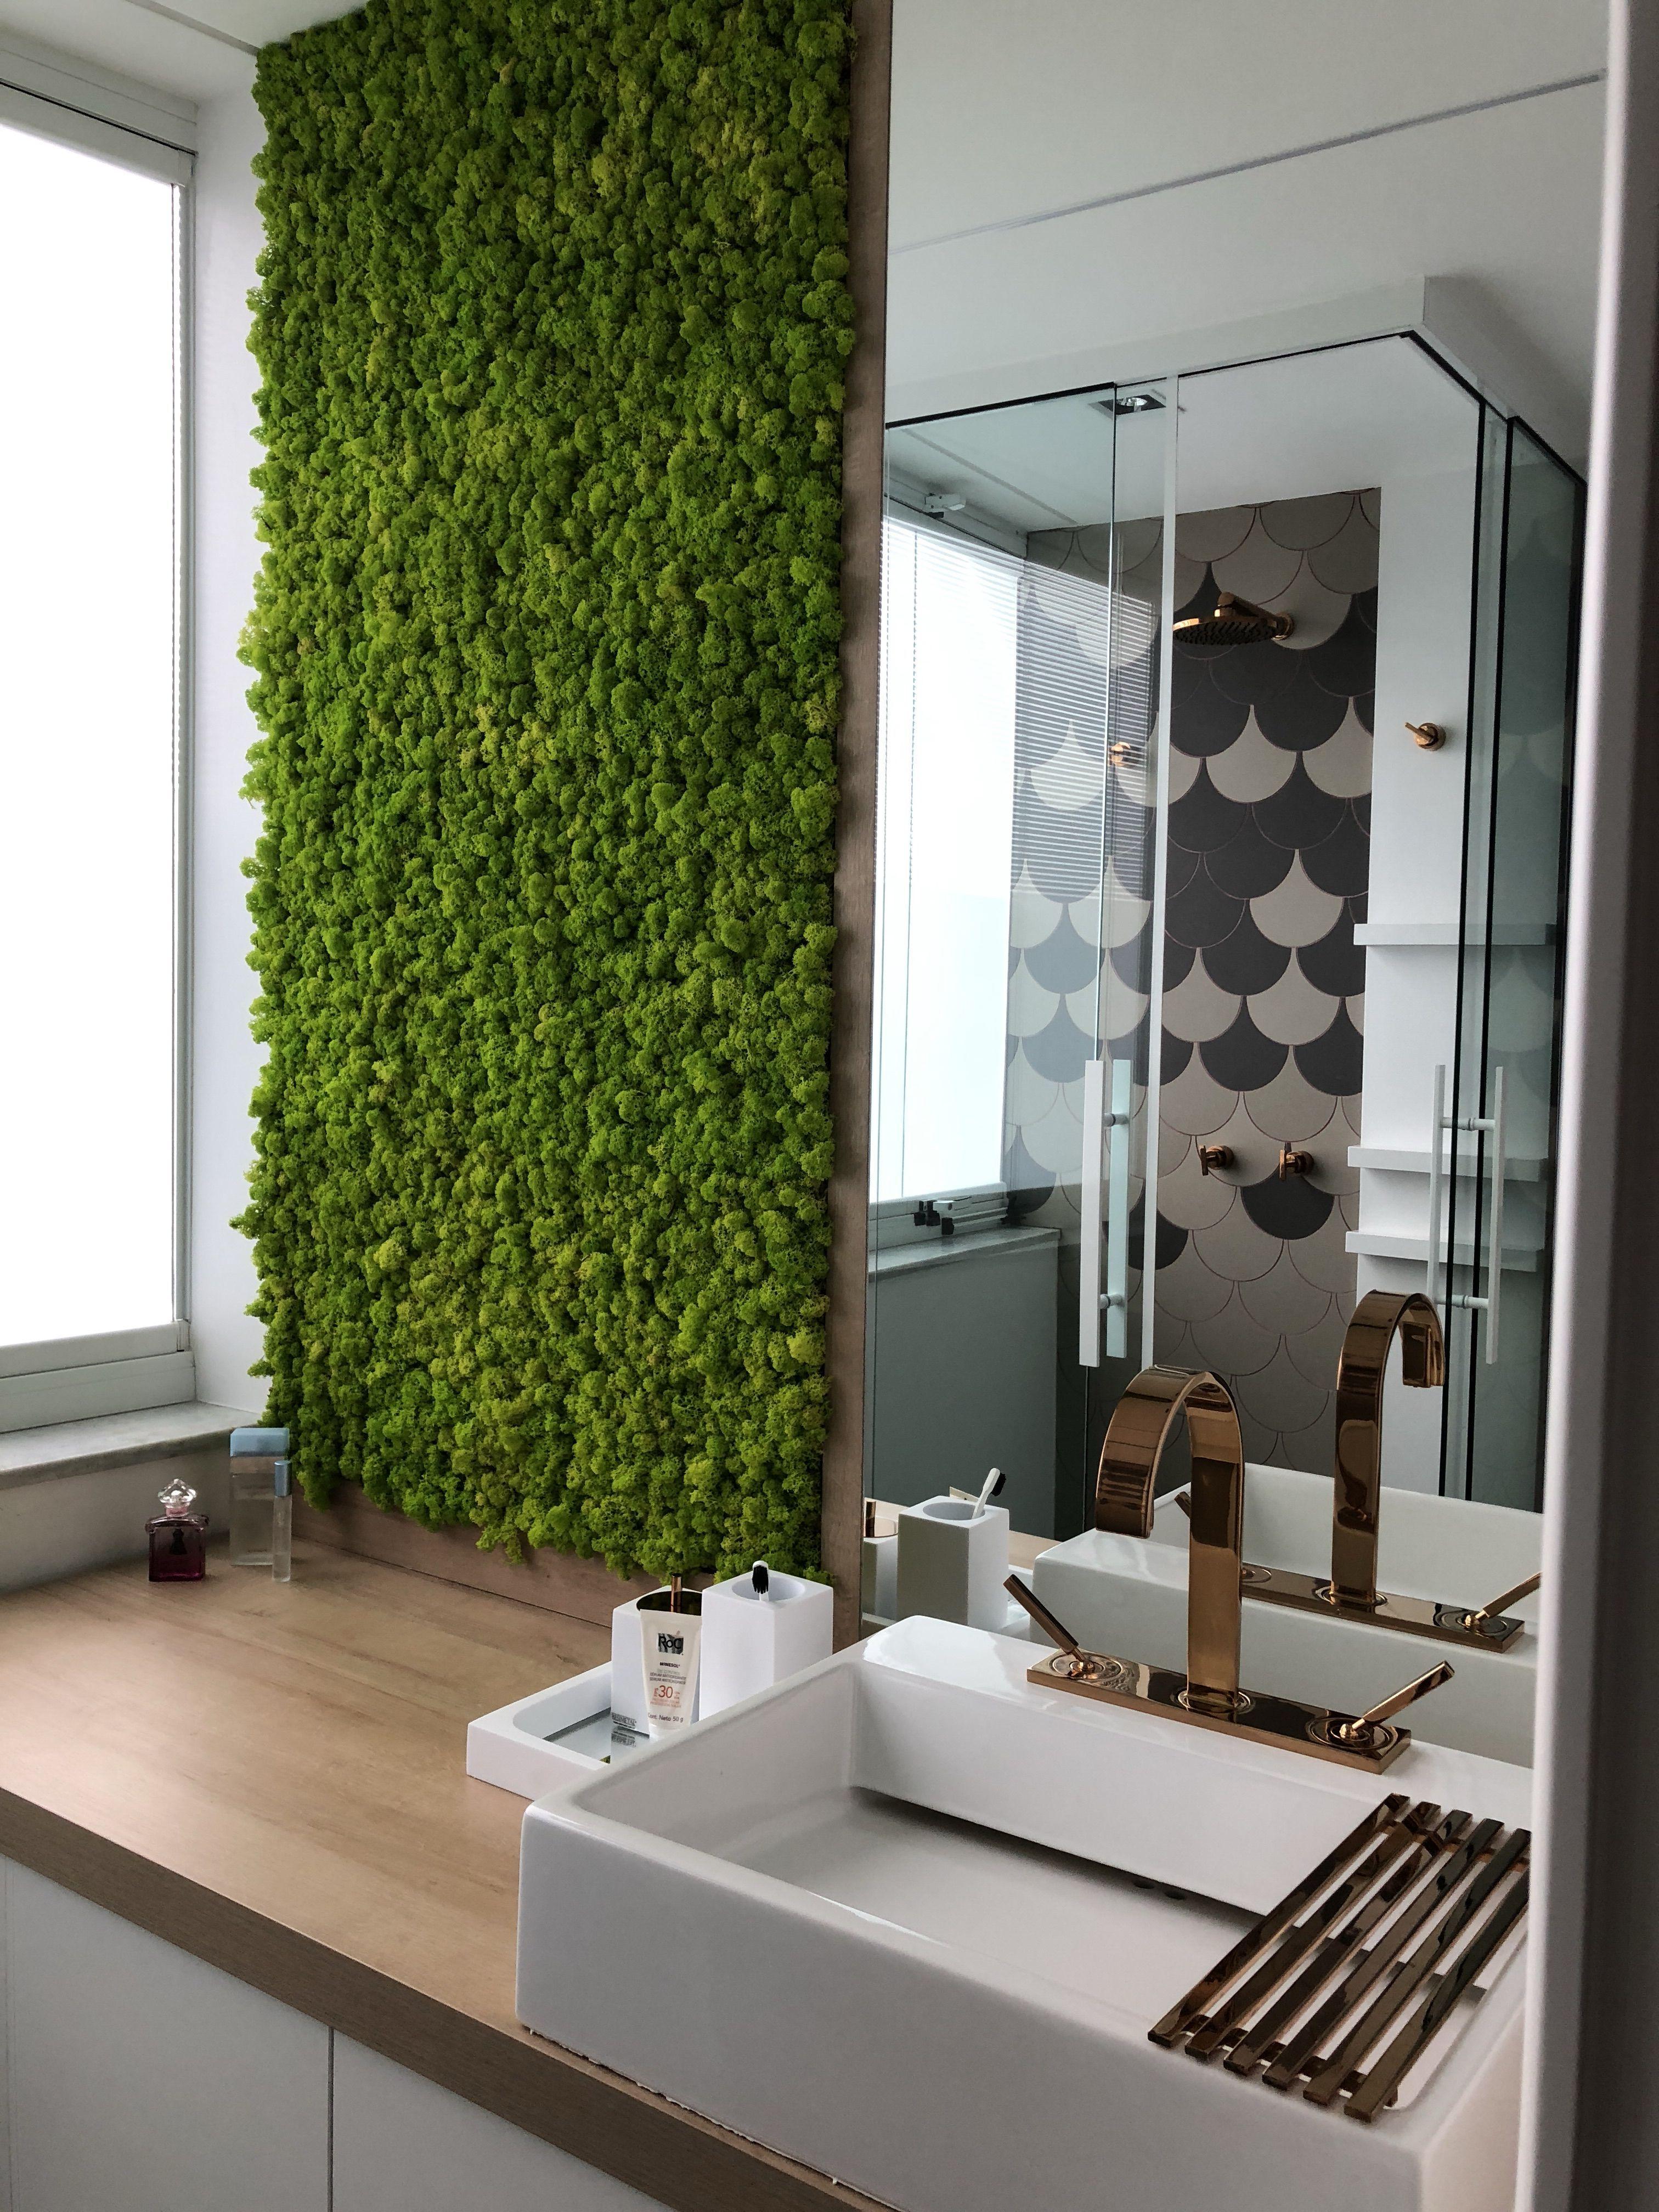 Banheiro Com Parede Revestida Por Moss Wall Proje In 2020 Wohnen Badezimmer Zimmer